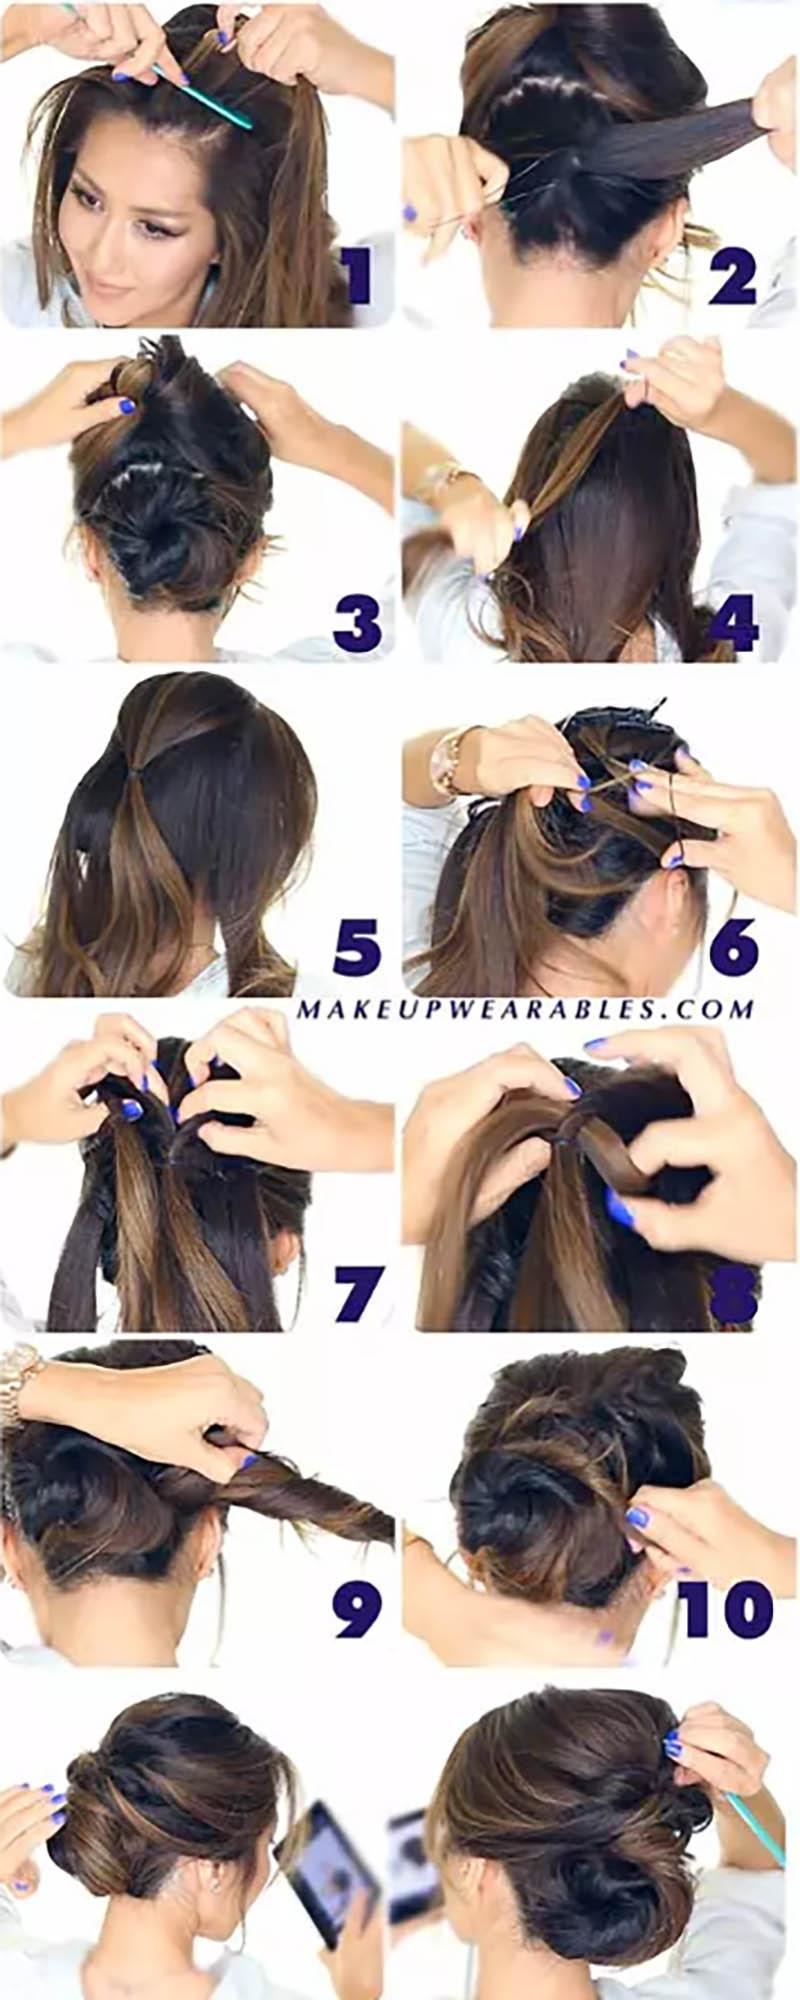 Búi tóc kiểu tự nhiên